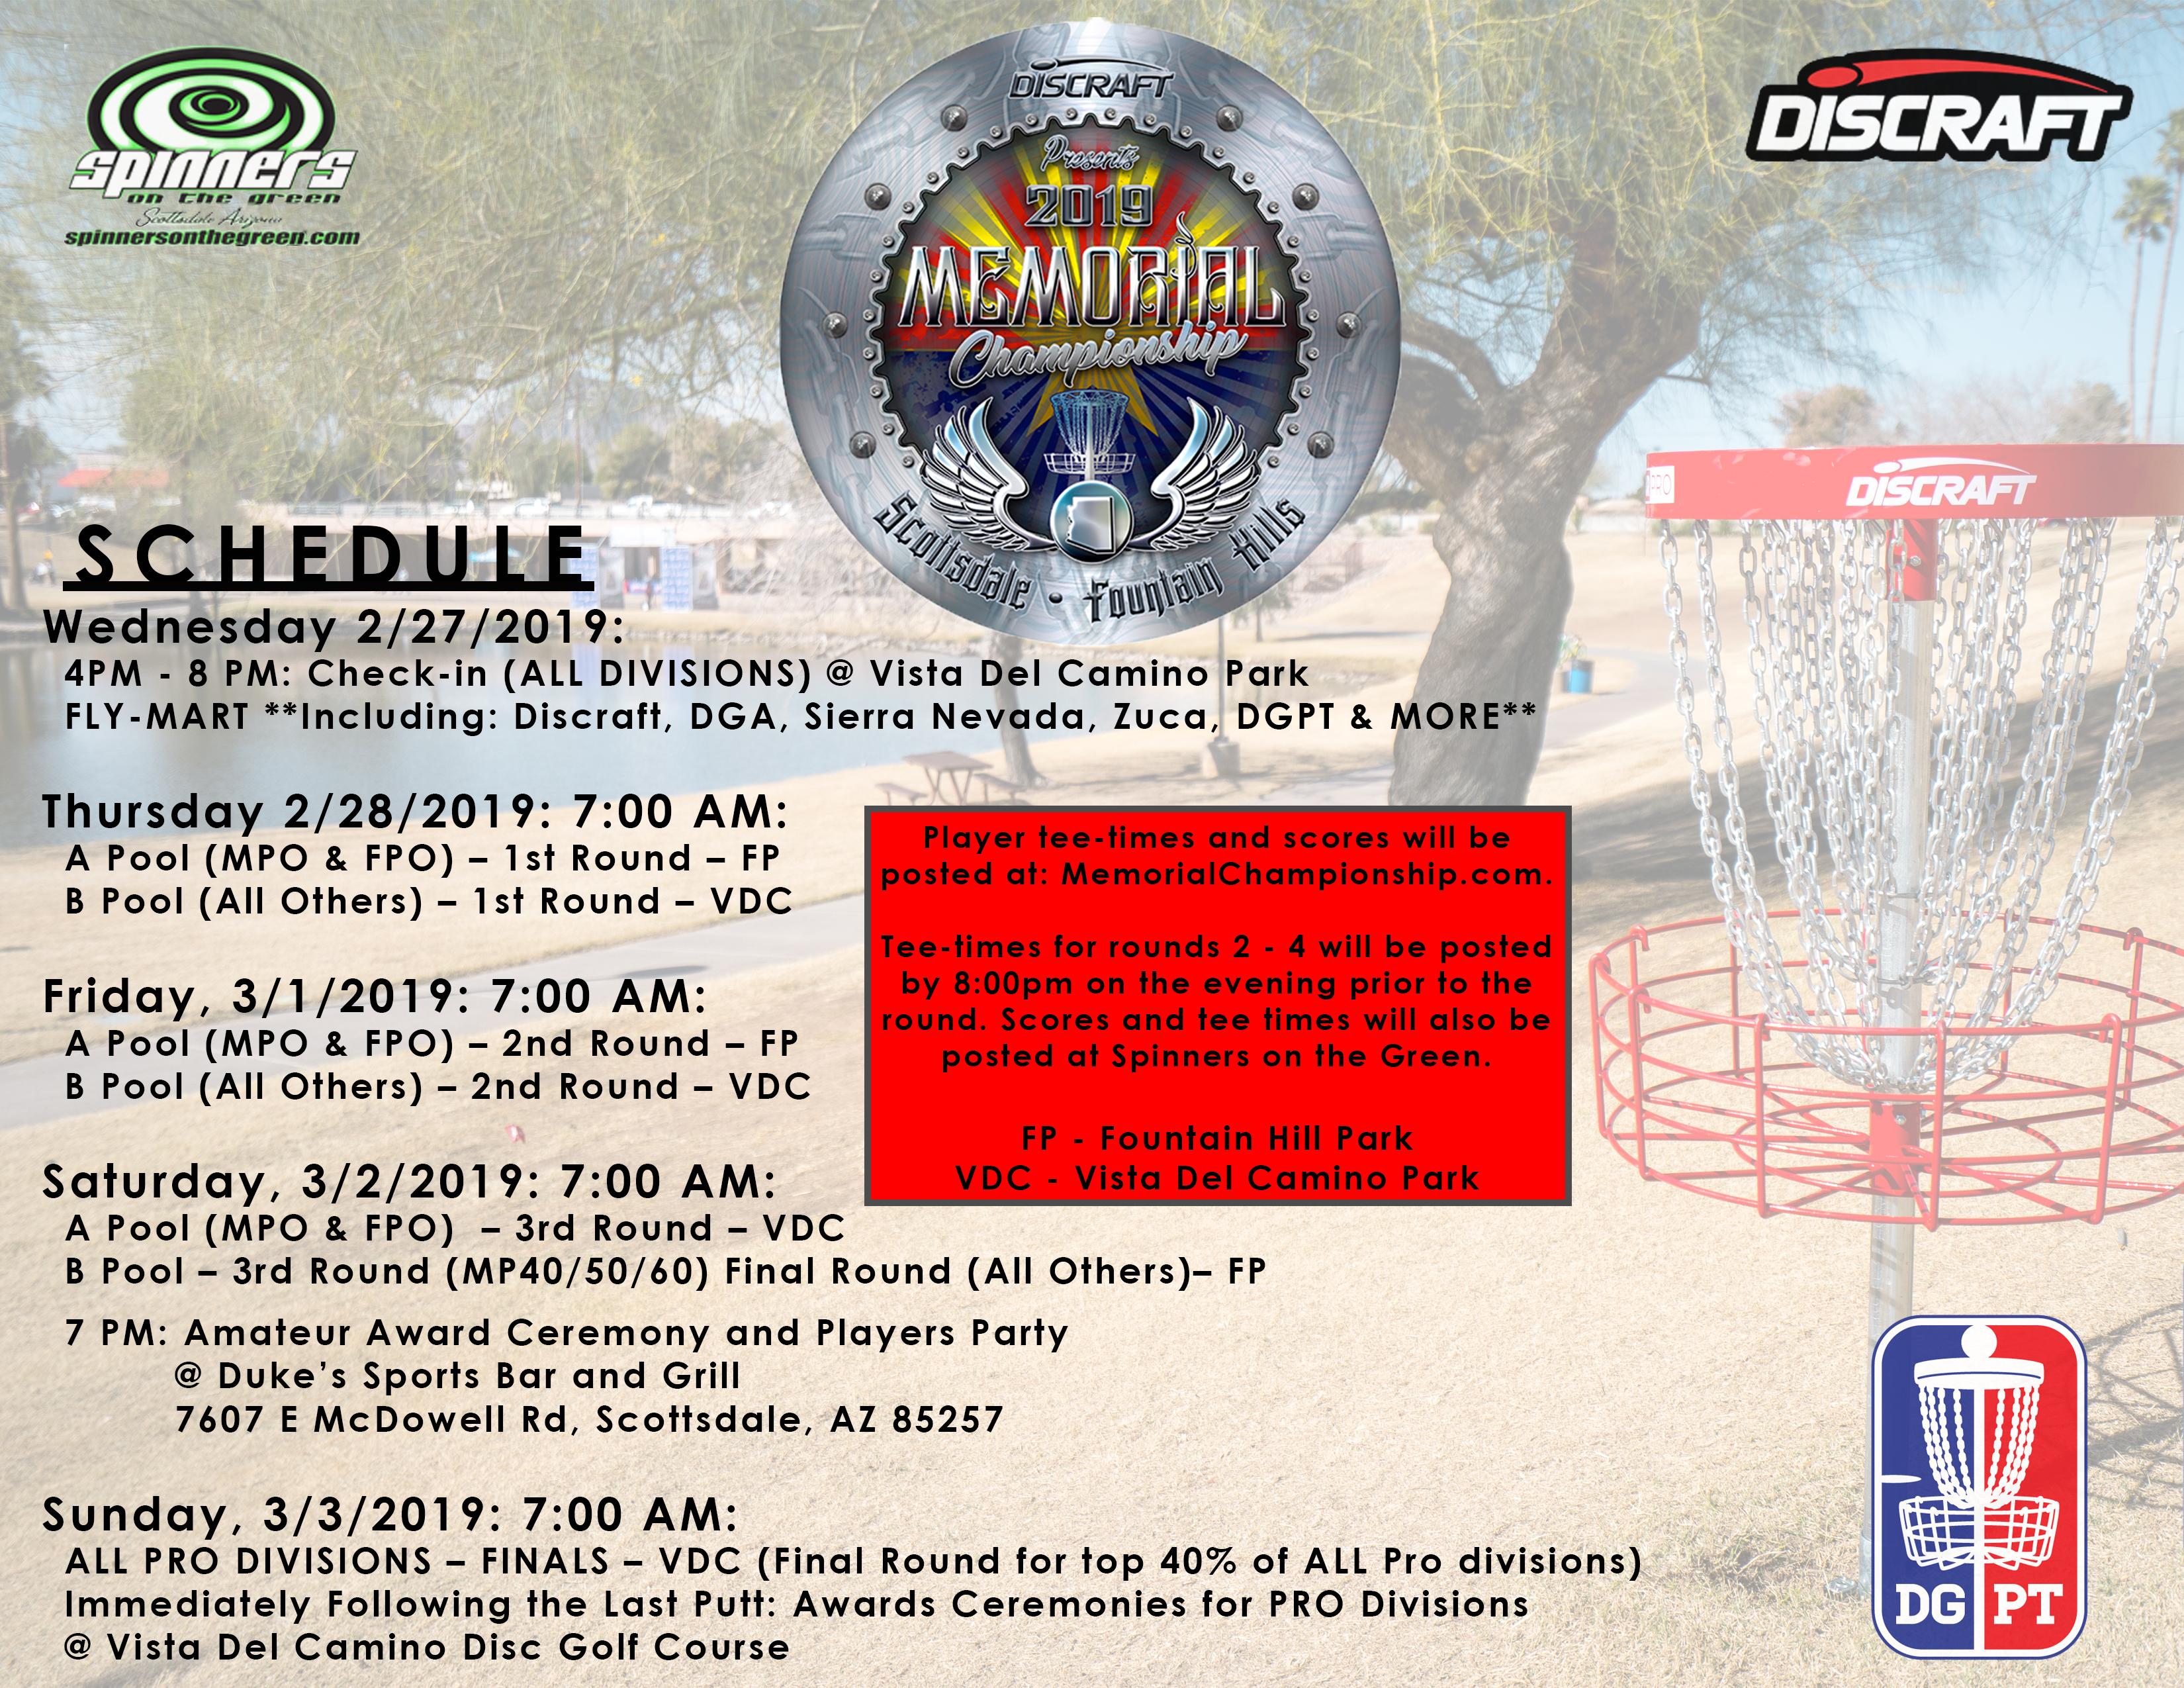 Disc Golf Pro Tour - Memorial Championship